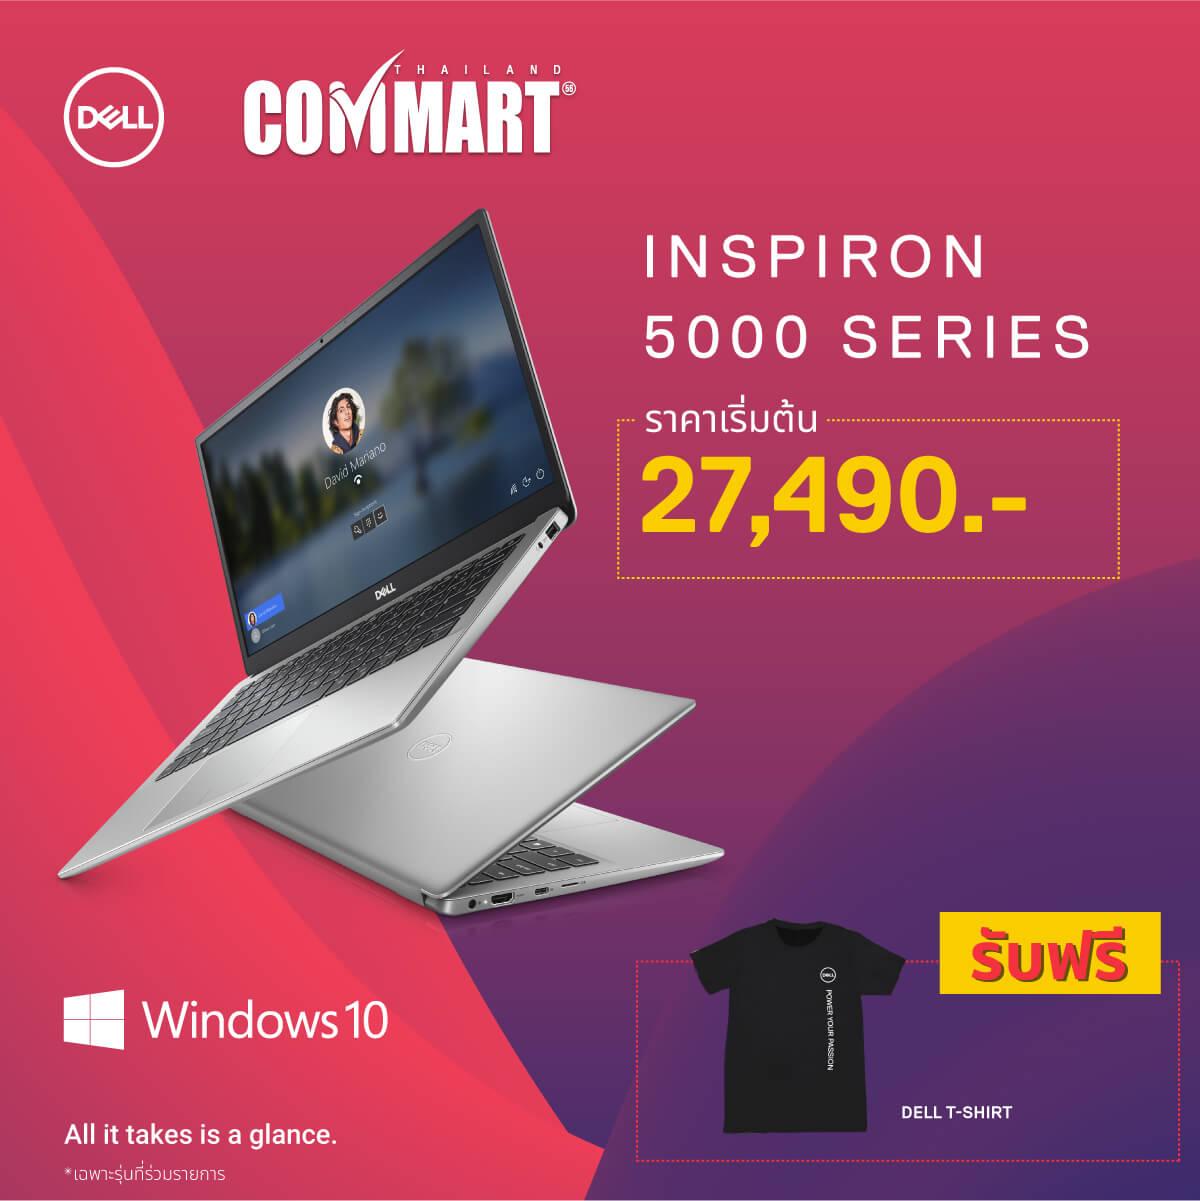 Dell Inspiron 5000 Series